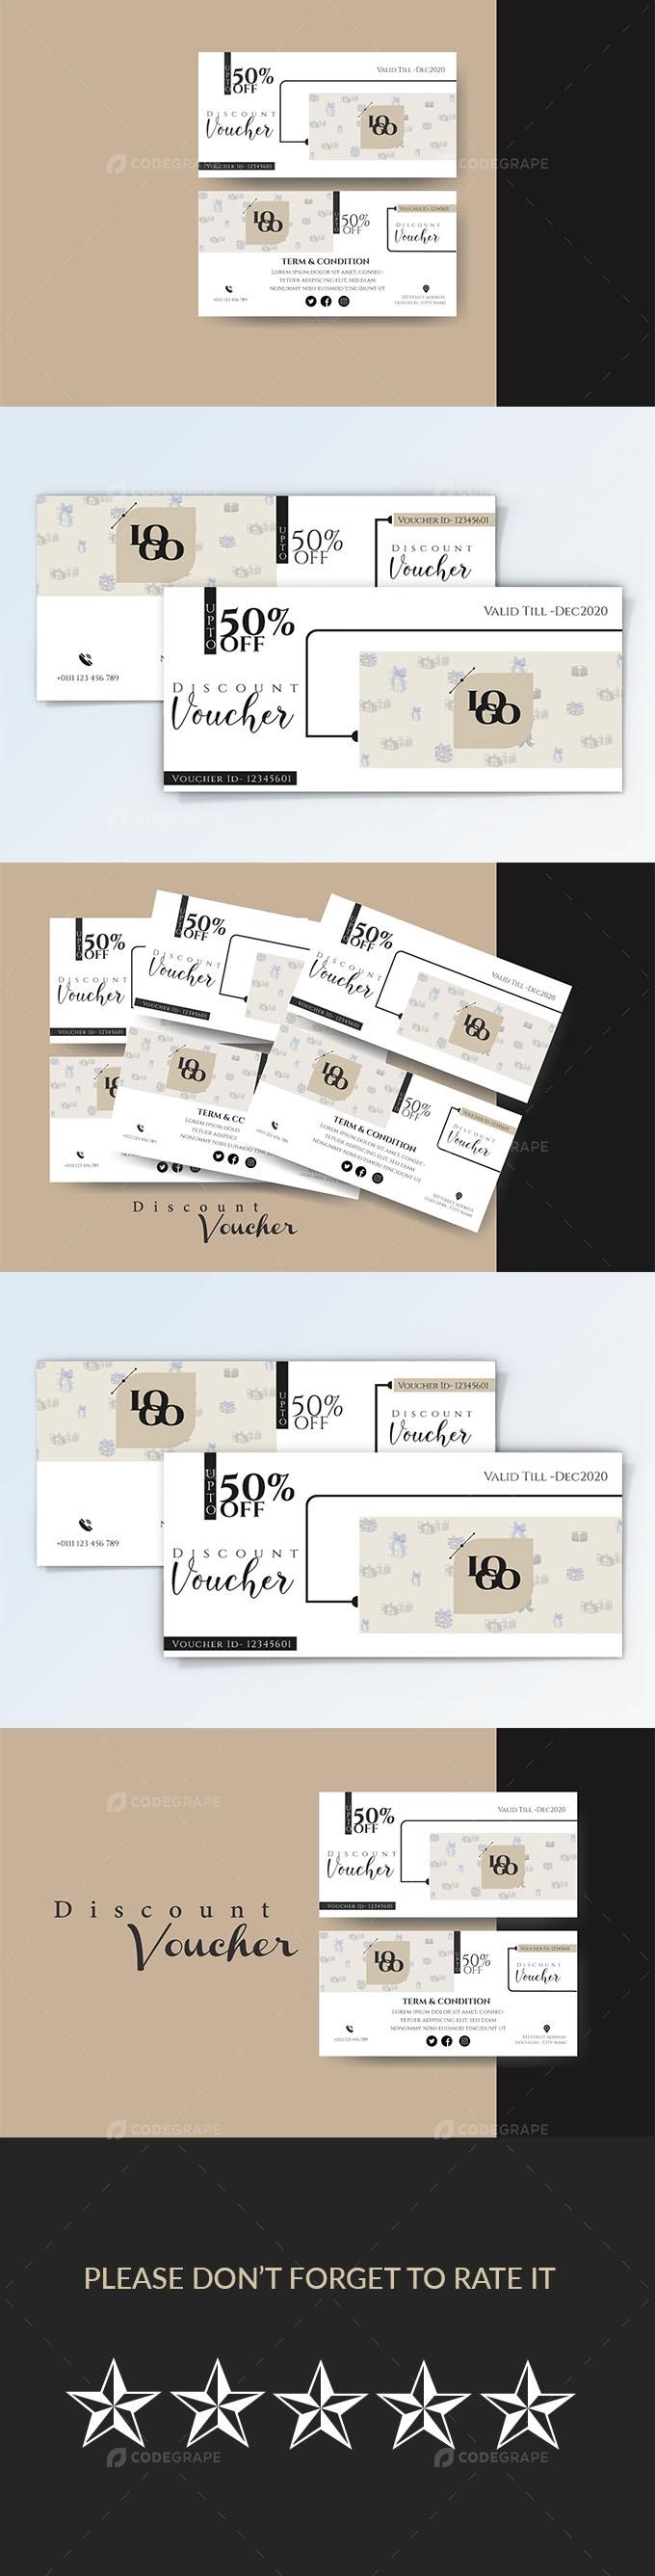 Trendy Discount Voucher Card Template